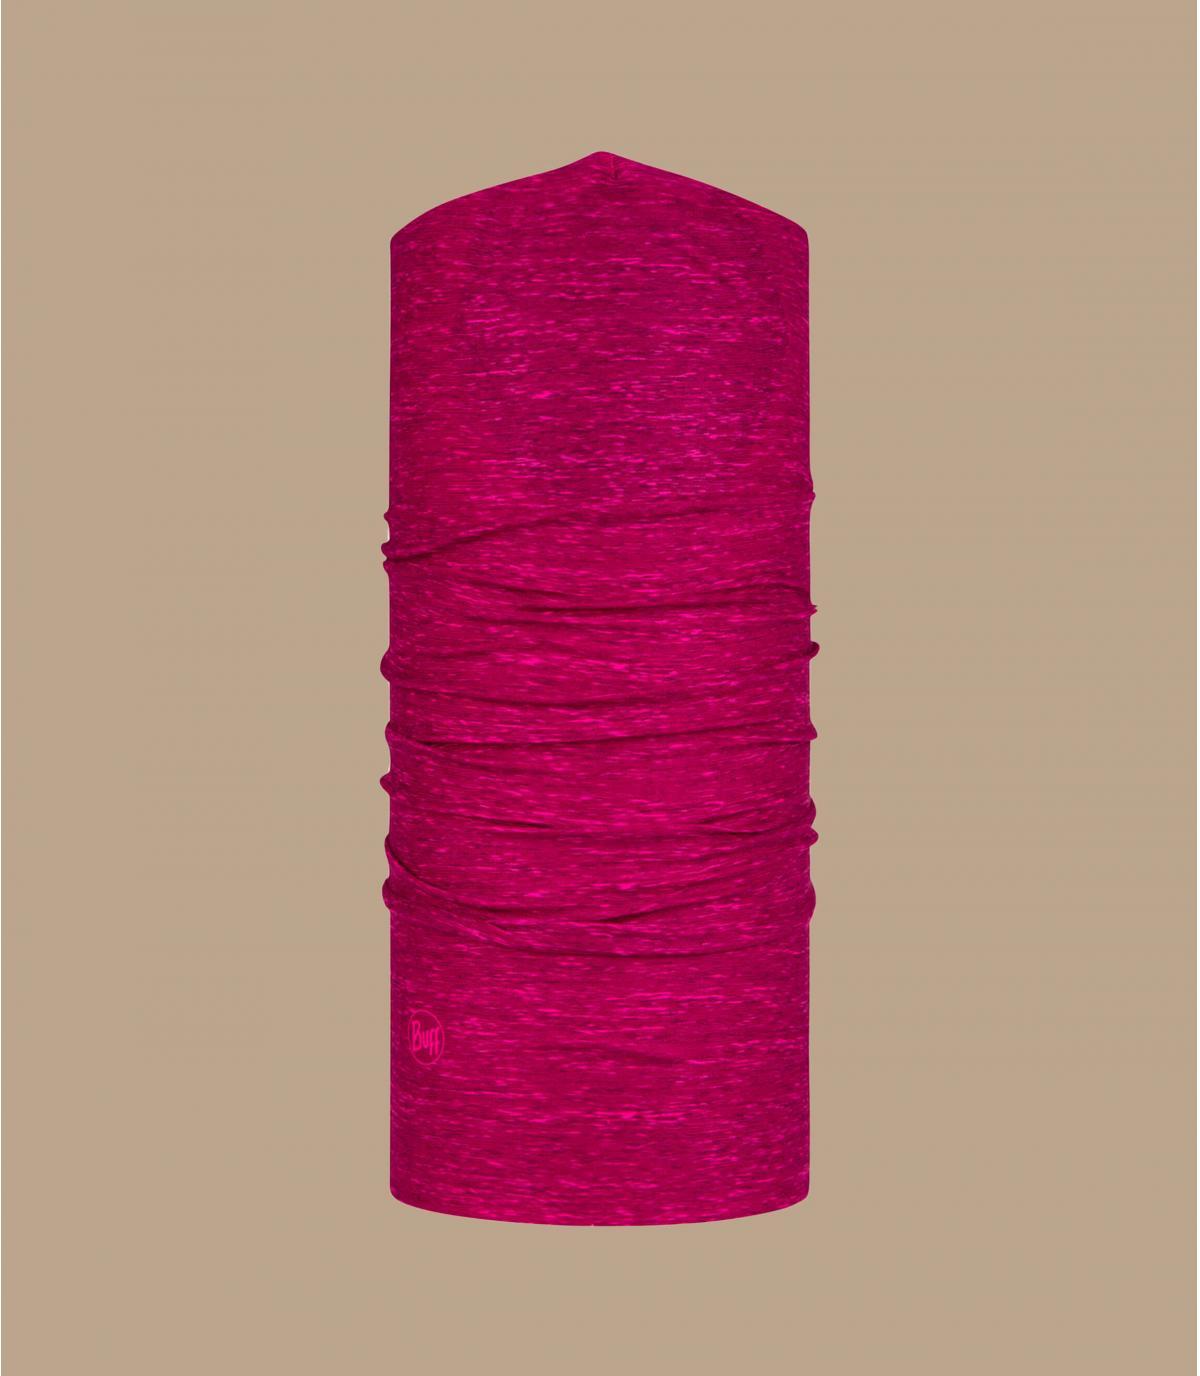 Détails Filter Tube pump pink - image 2